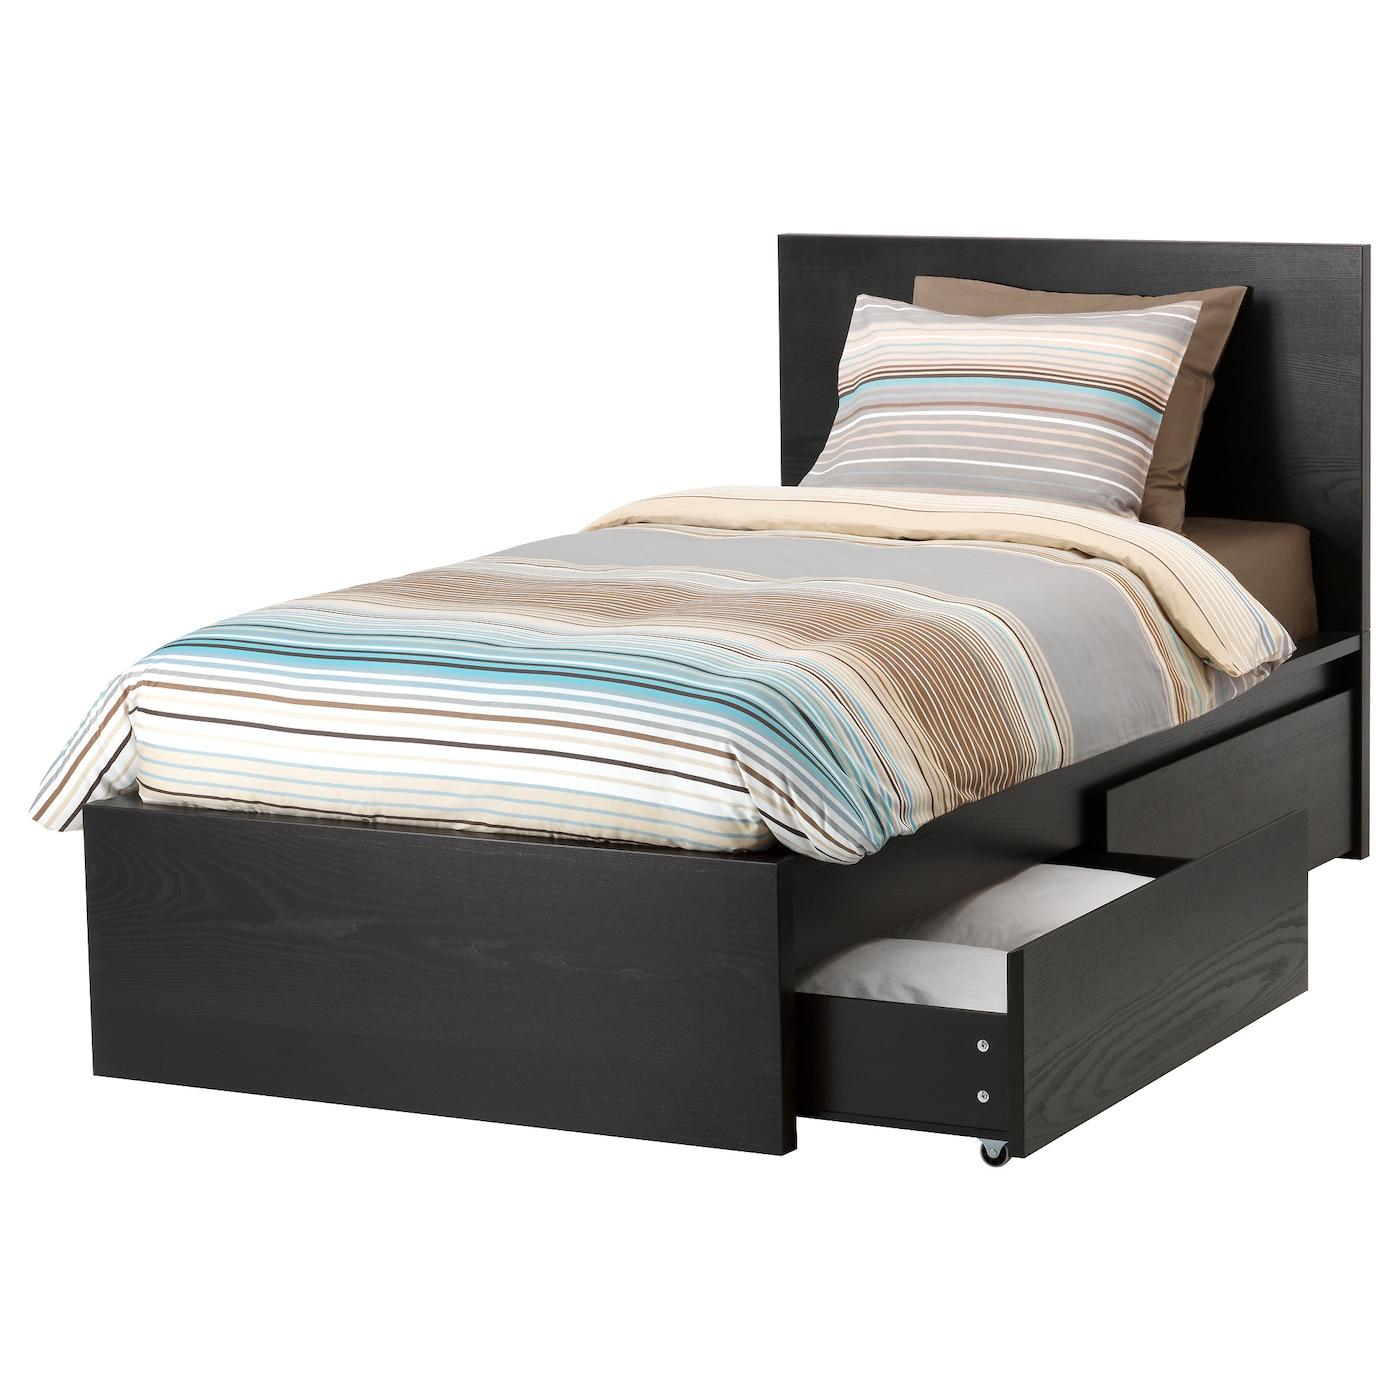 Malm Single Bed Frame